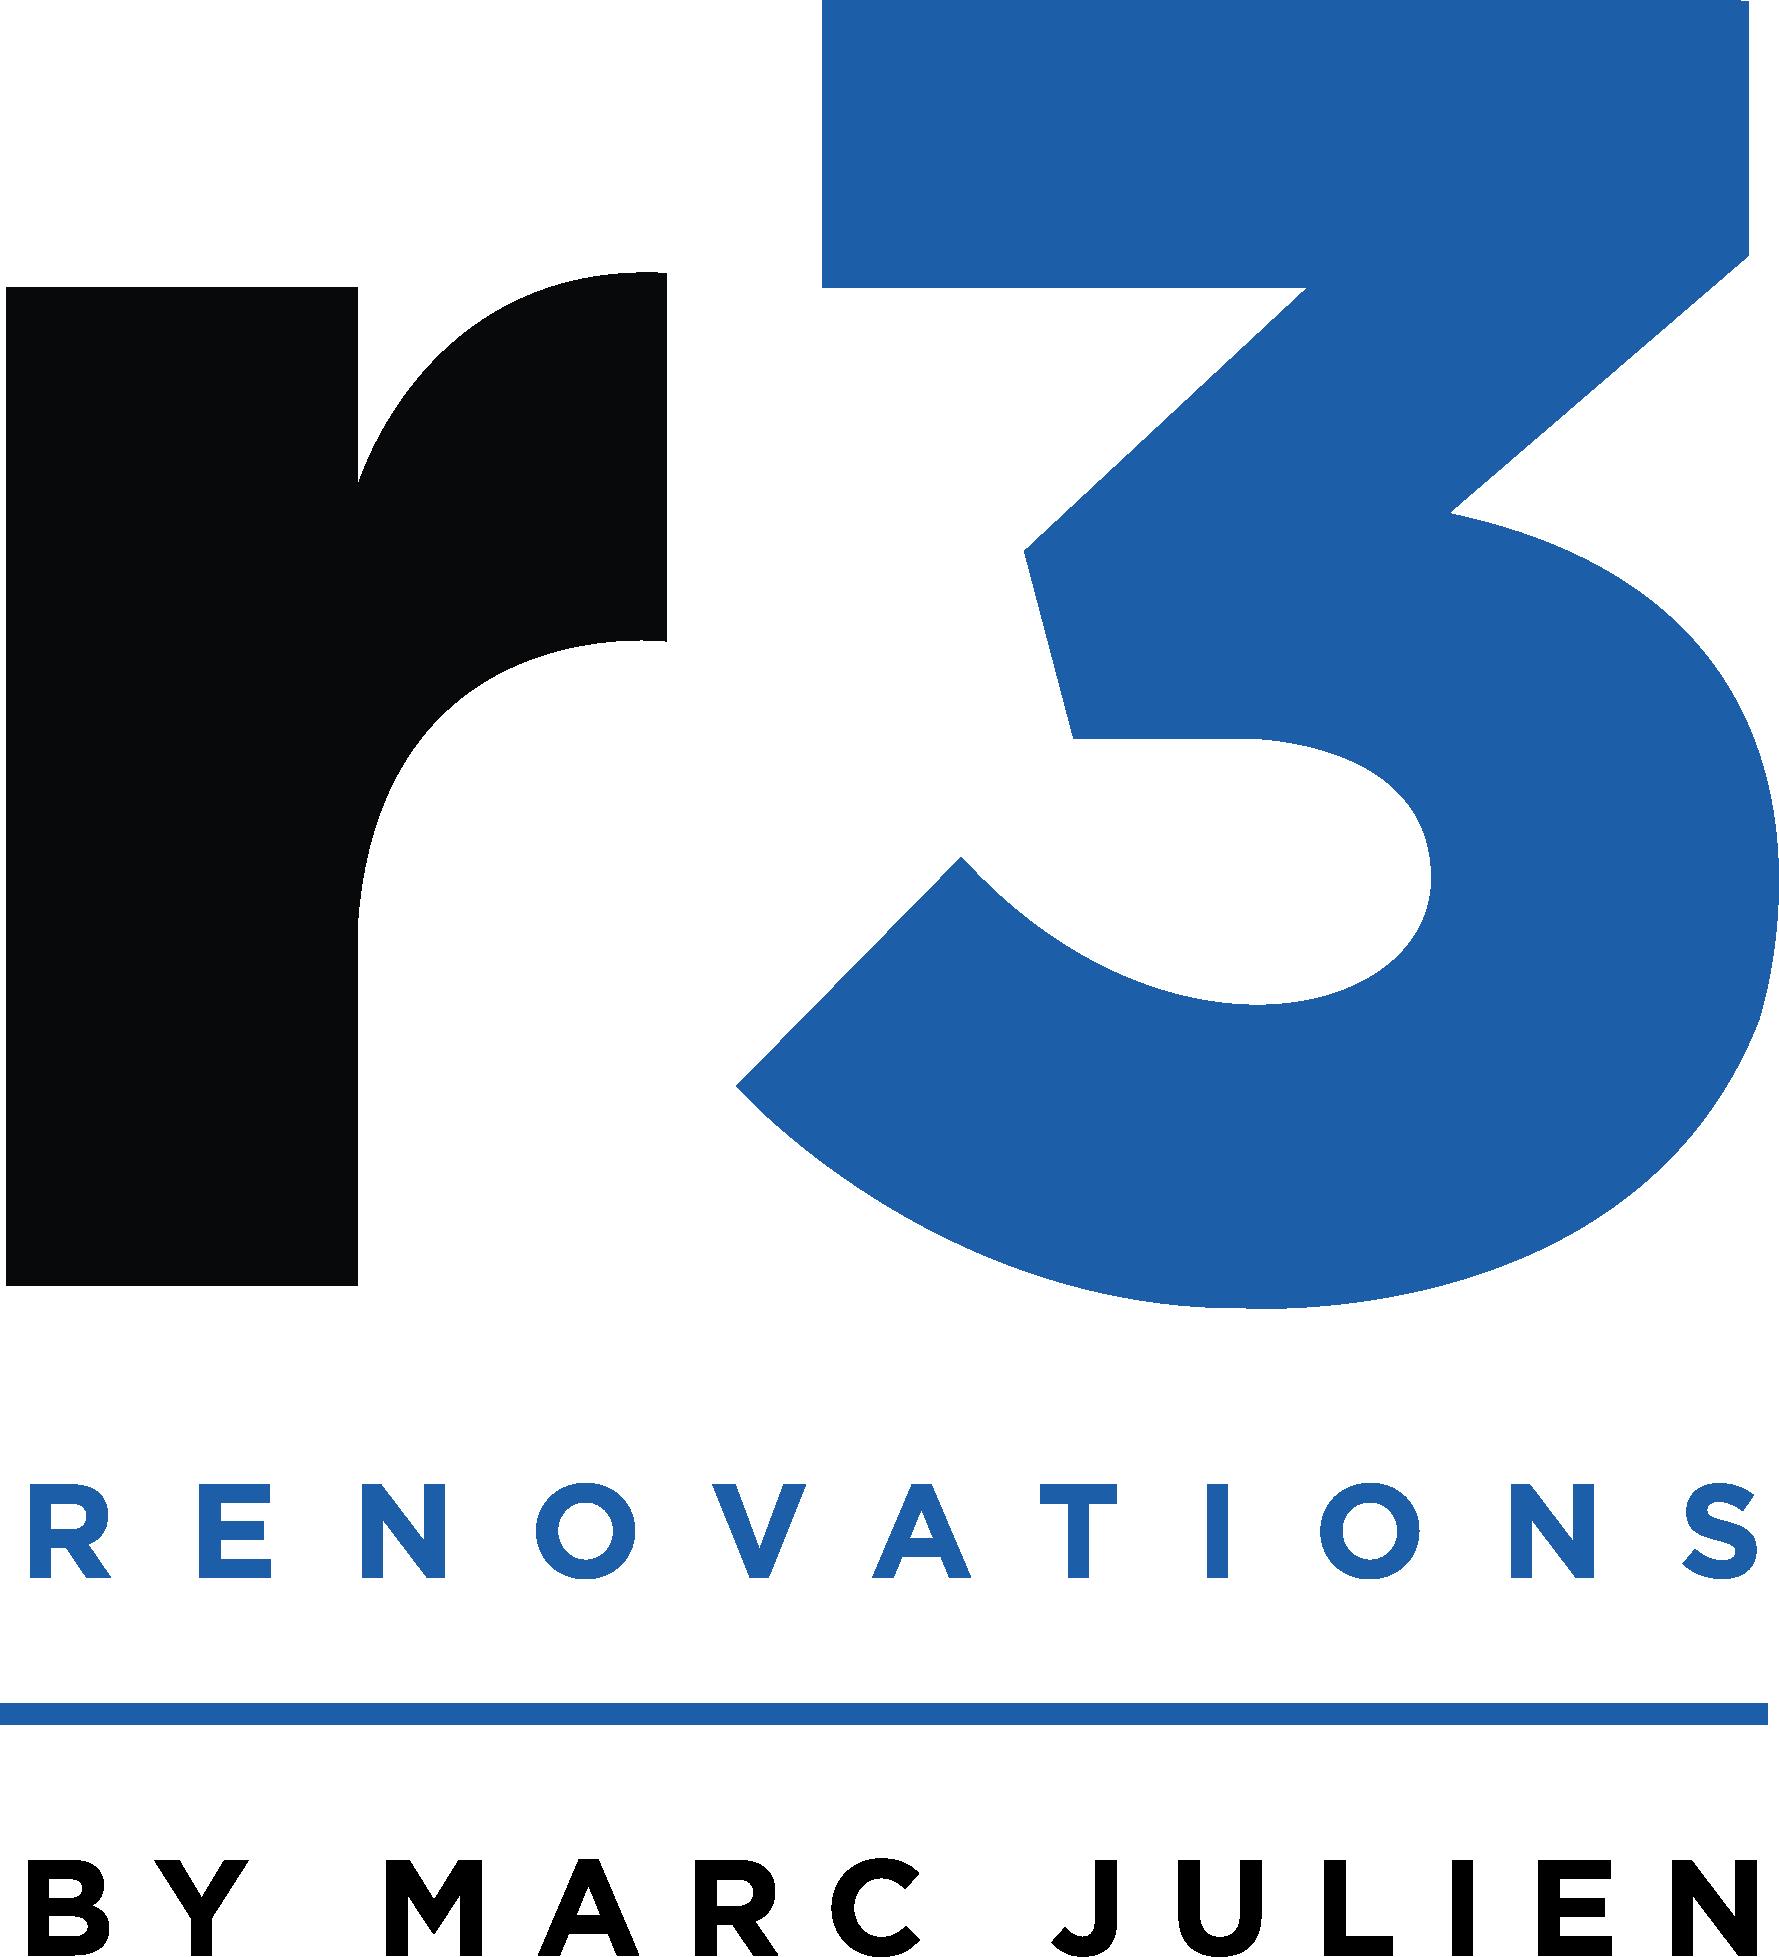 R3 Renovations